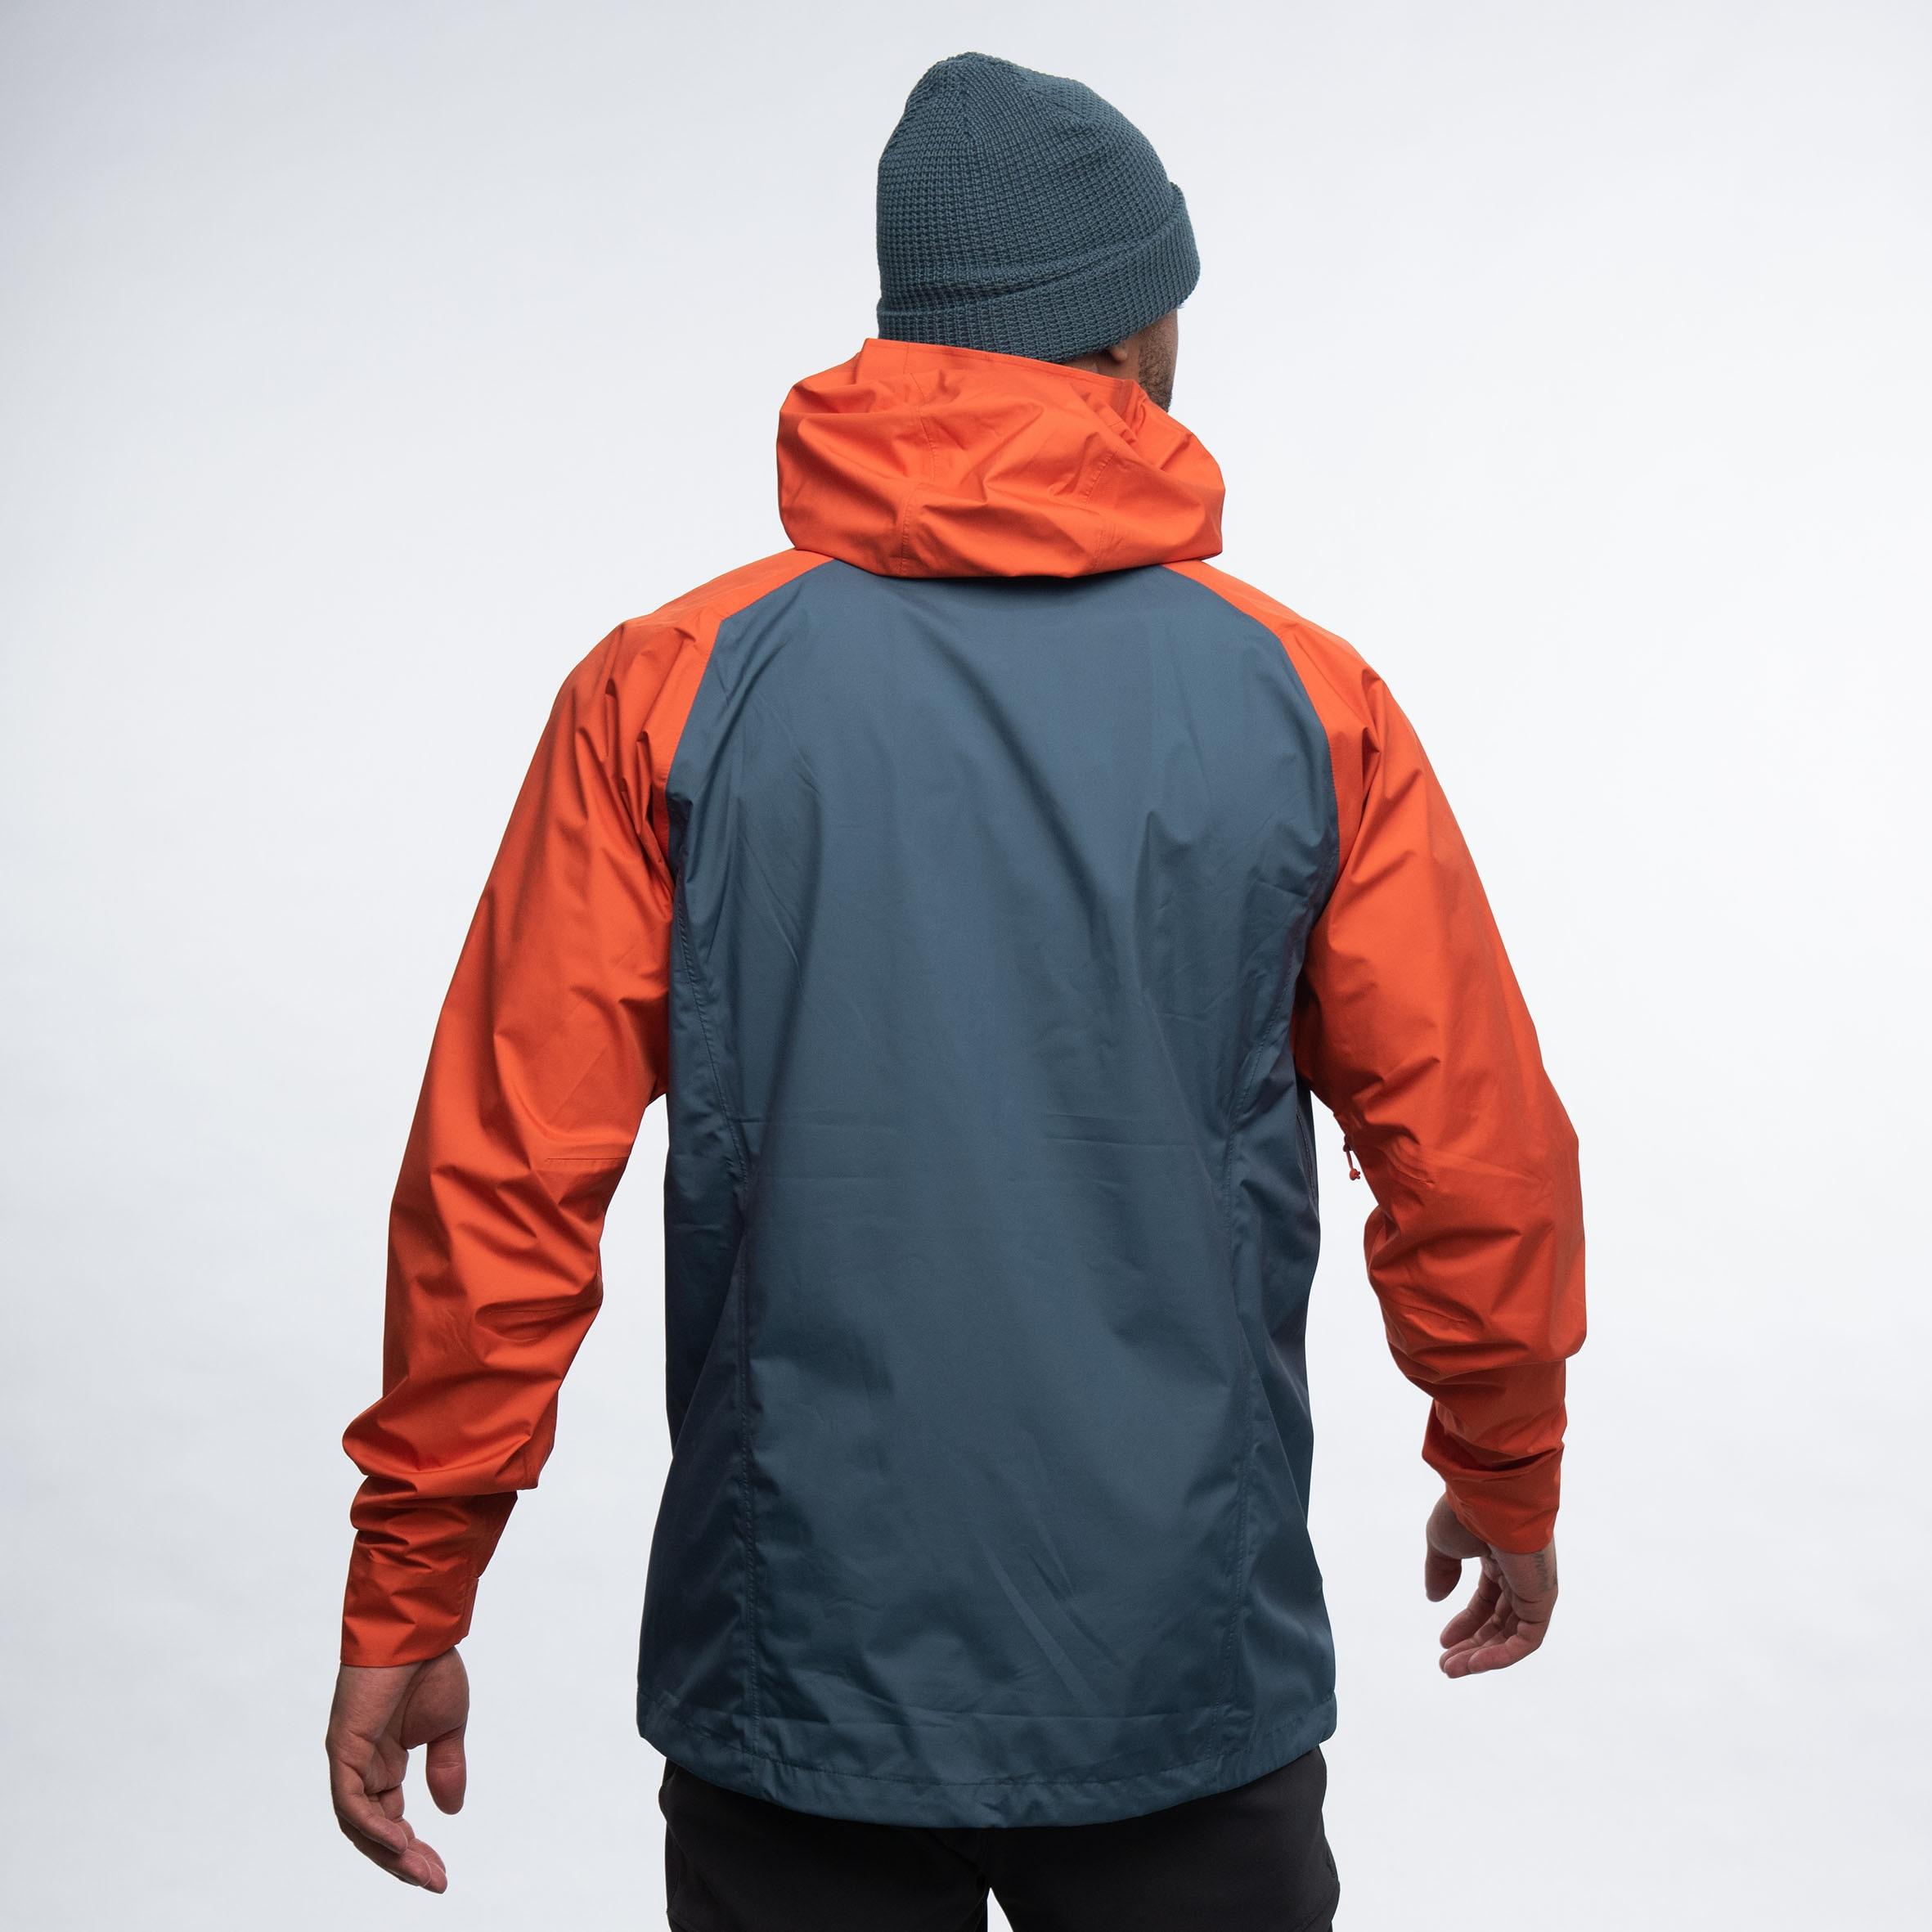 Letto V2 3L Jacket